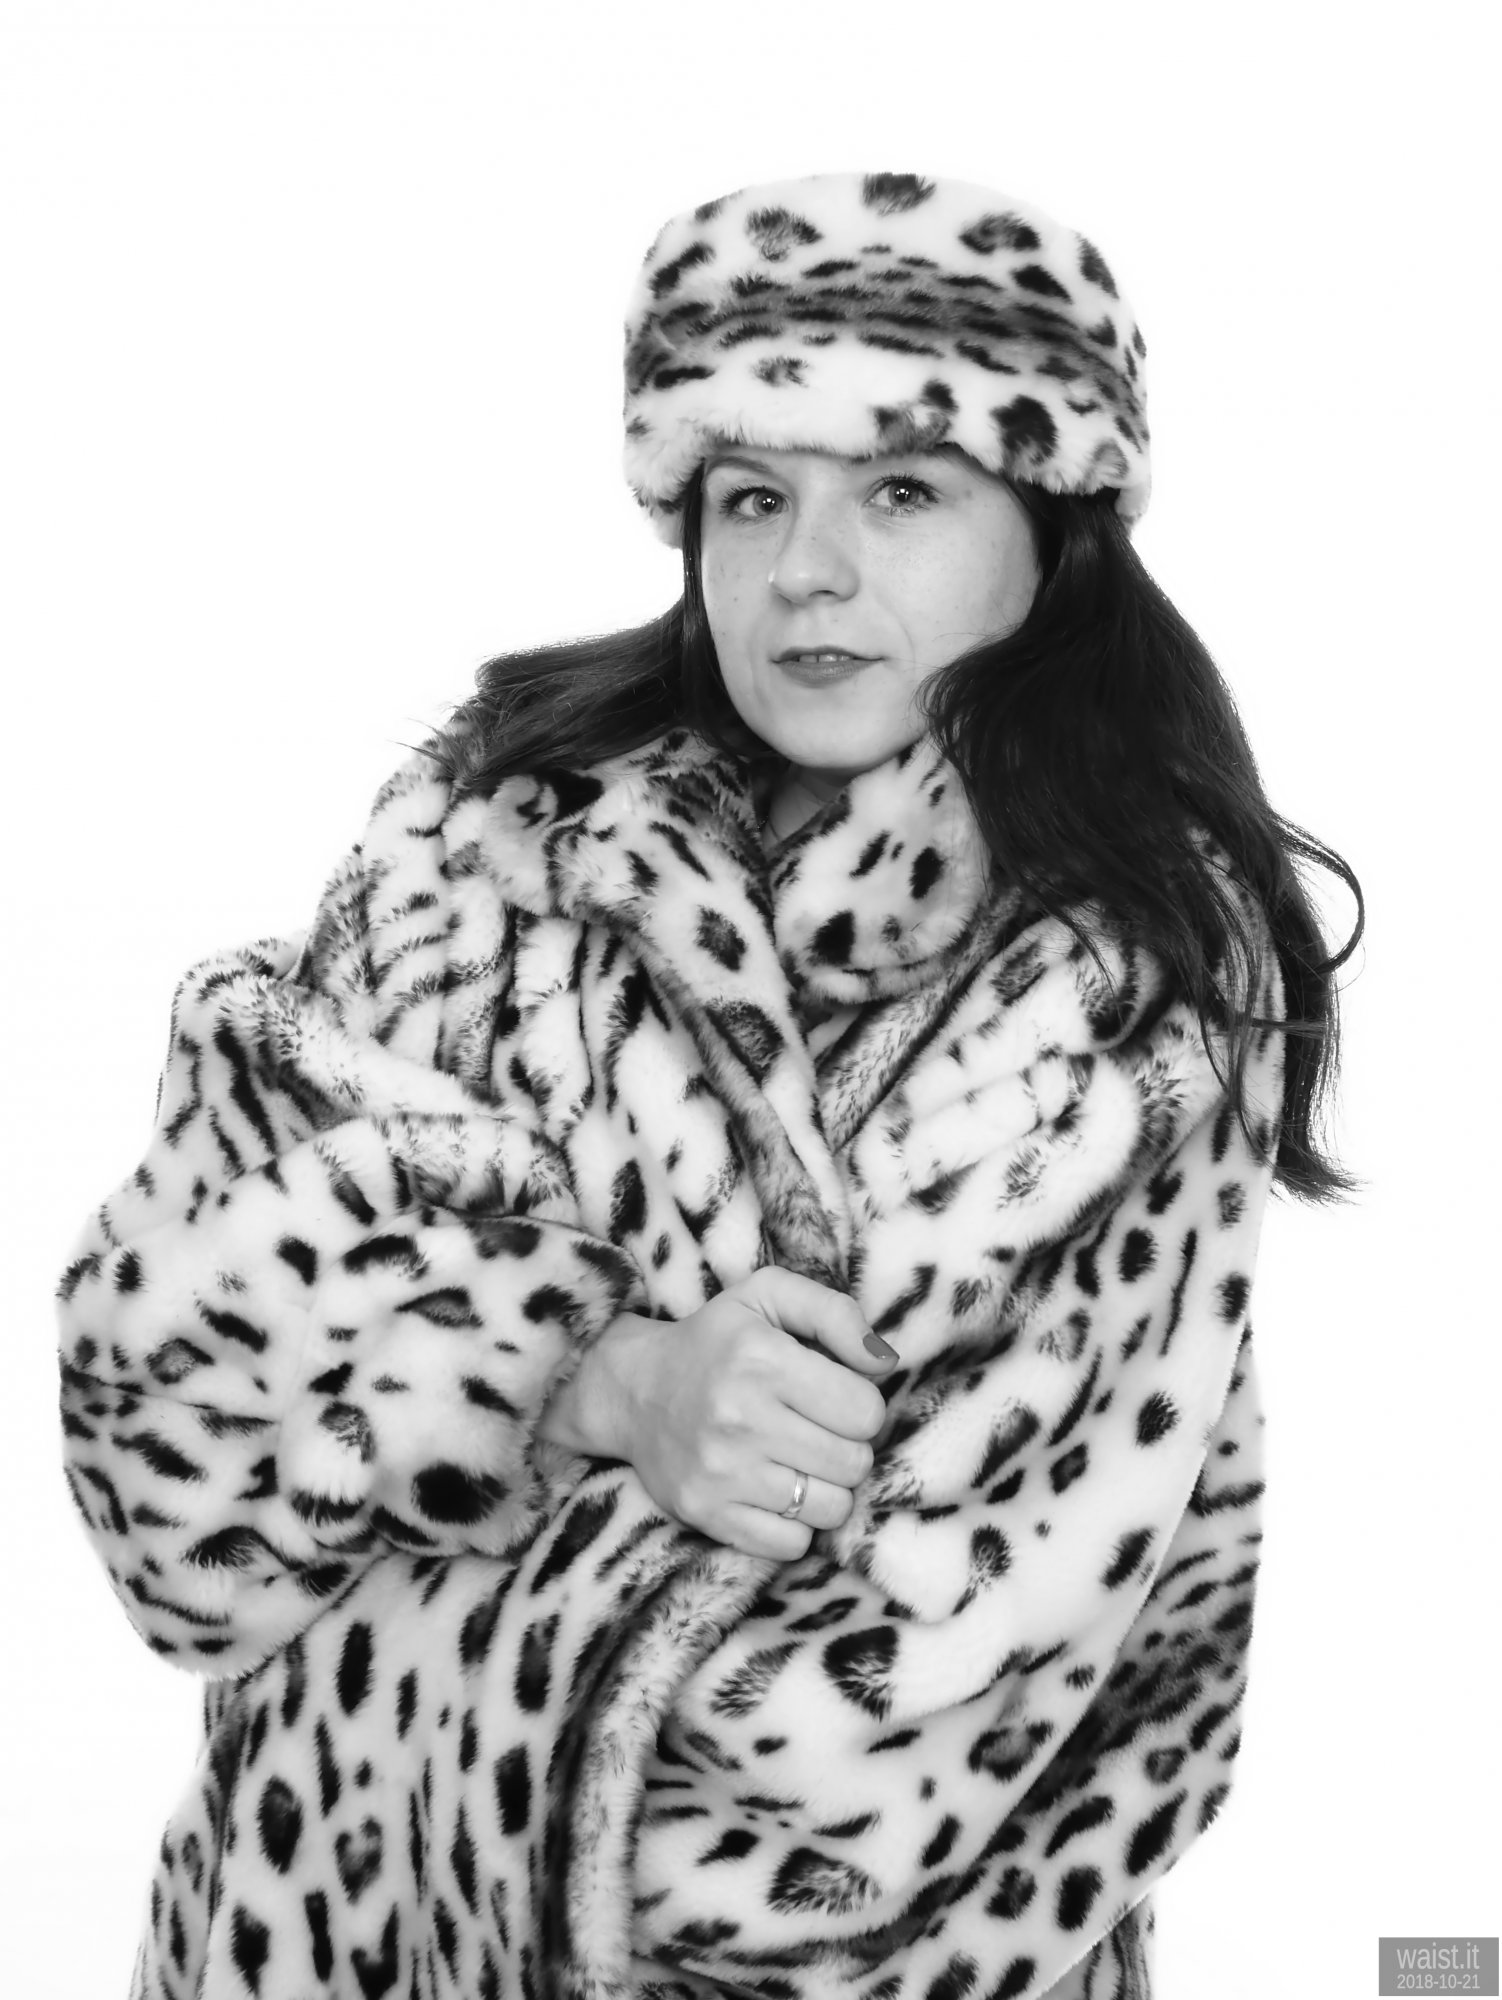 2018-10-21 Darya (DaryaM) in vintage fur coat (synthetic) and matchig hat